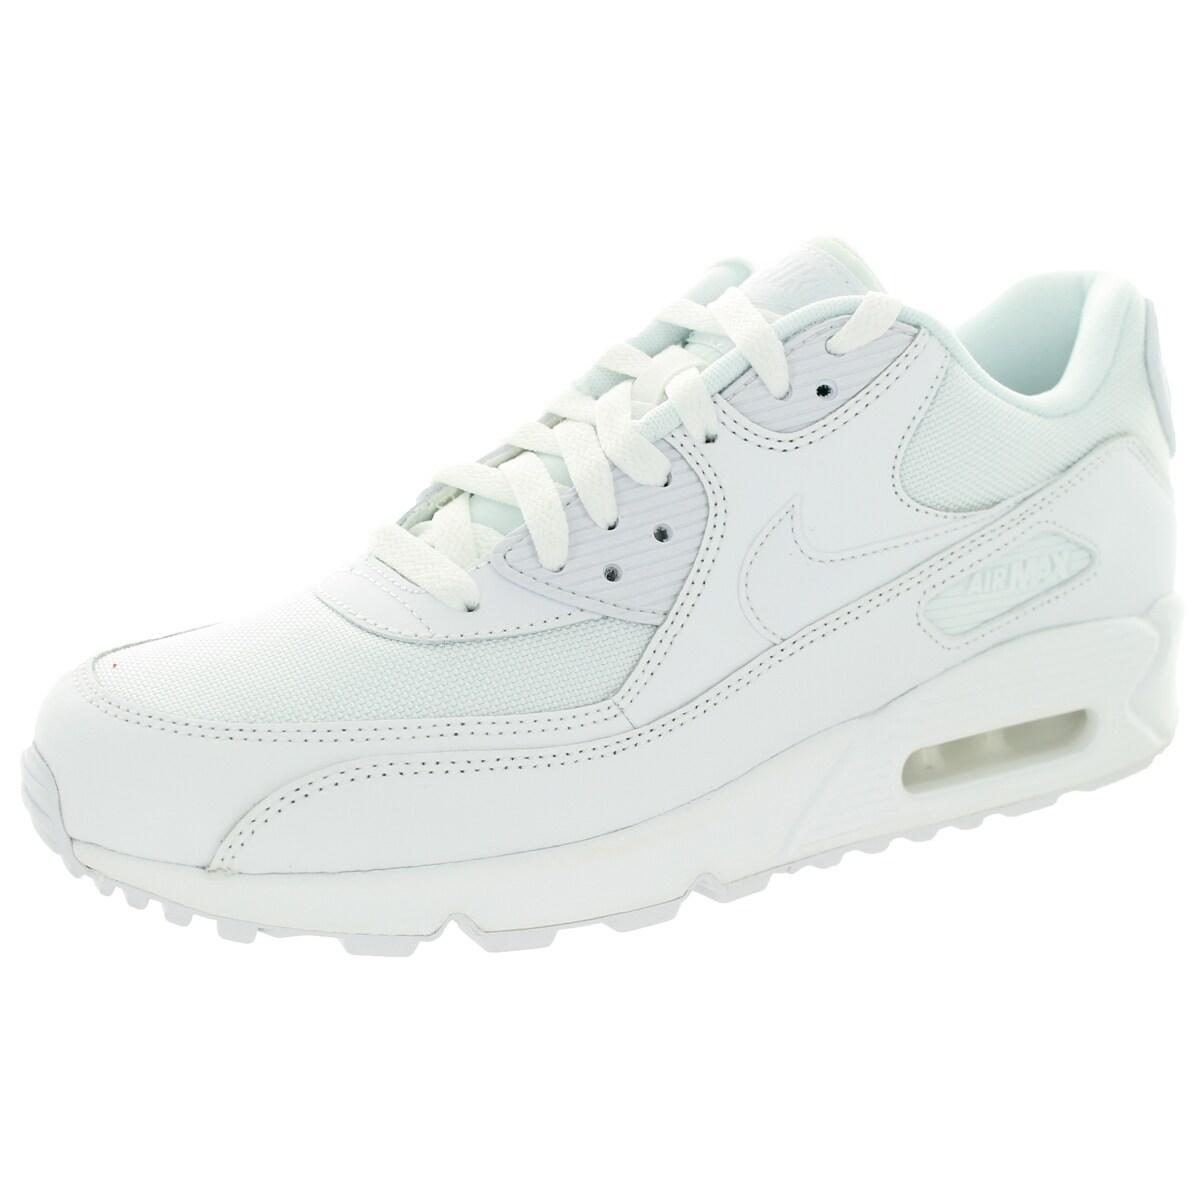 Nike Men's Air Max 90 Essential White/White/White/White R...